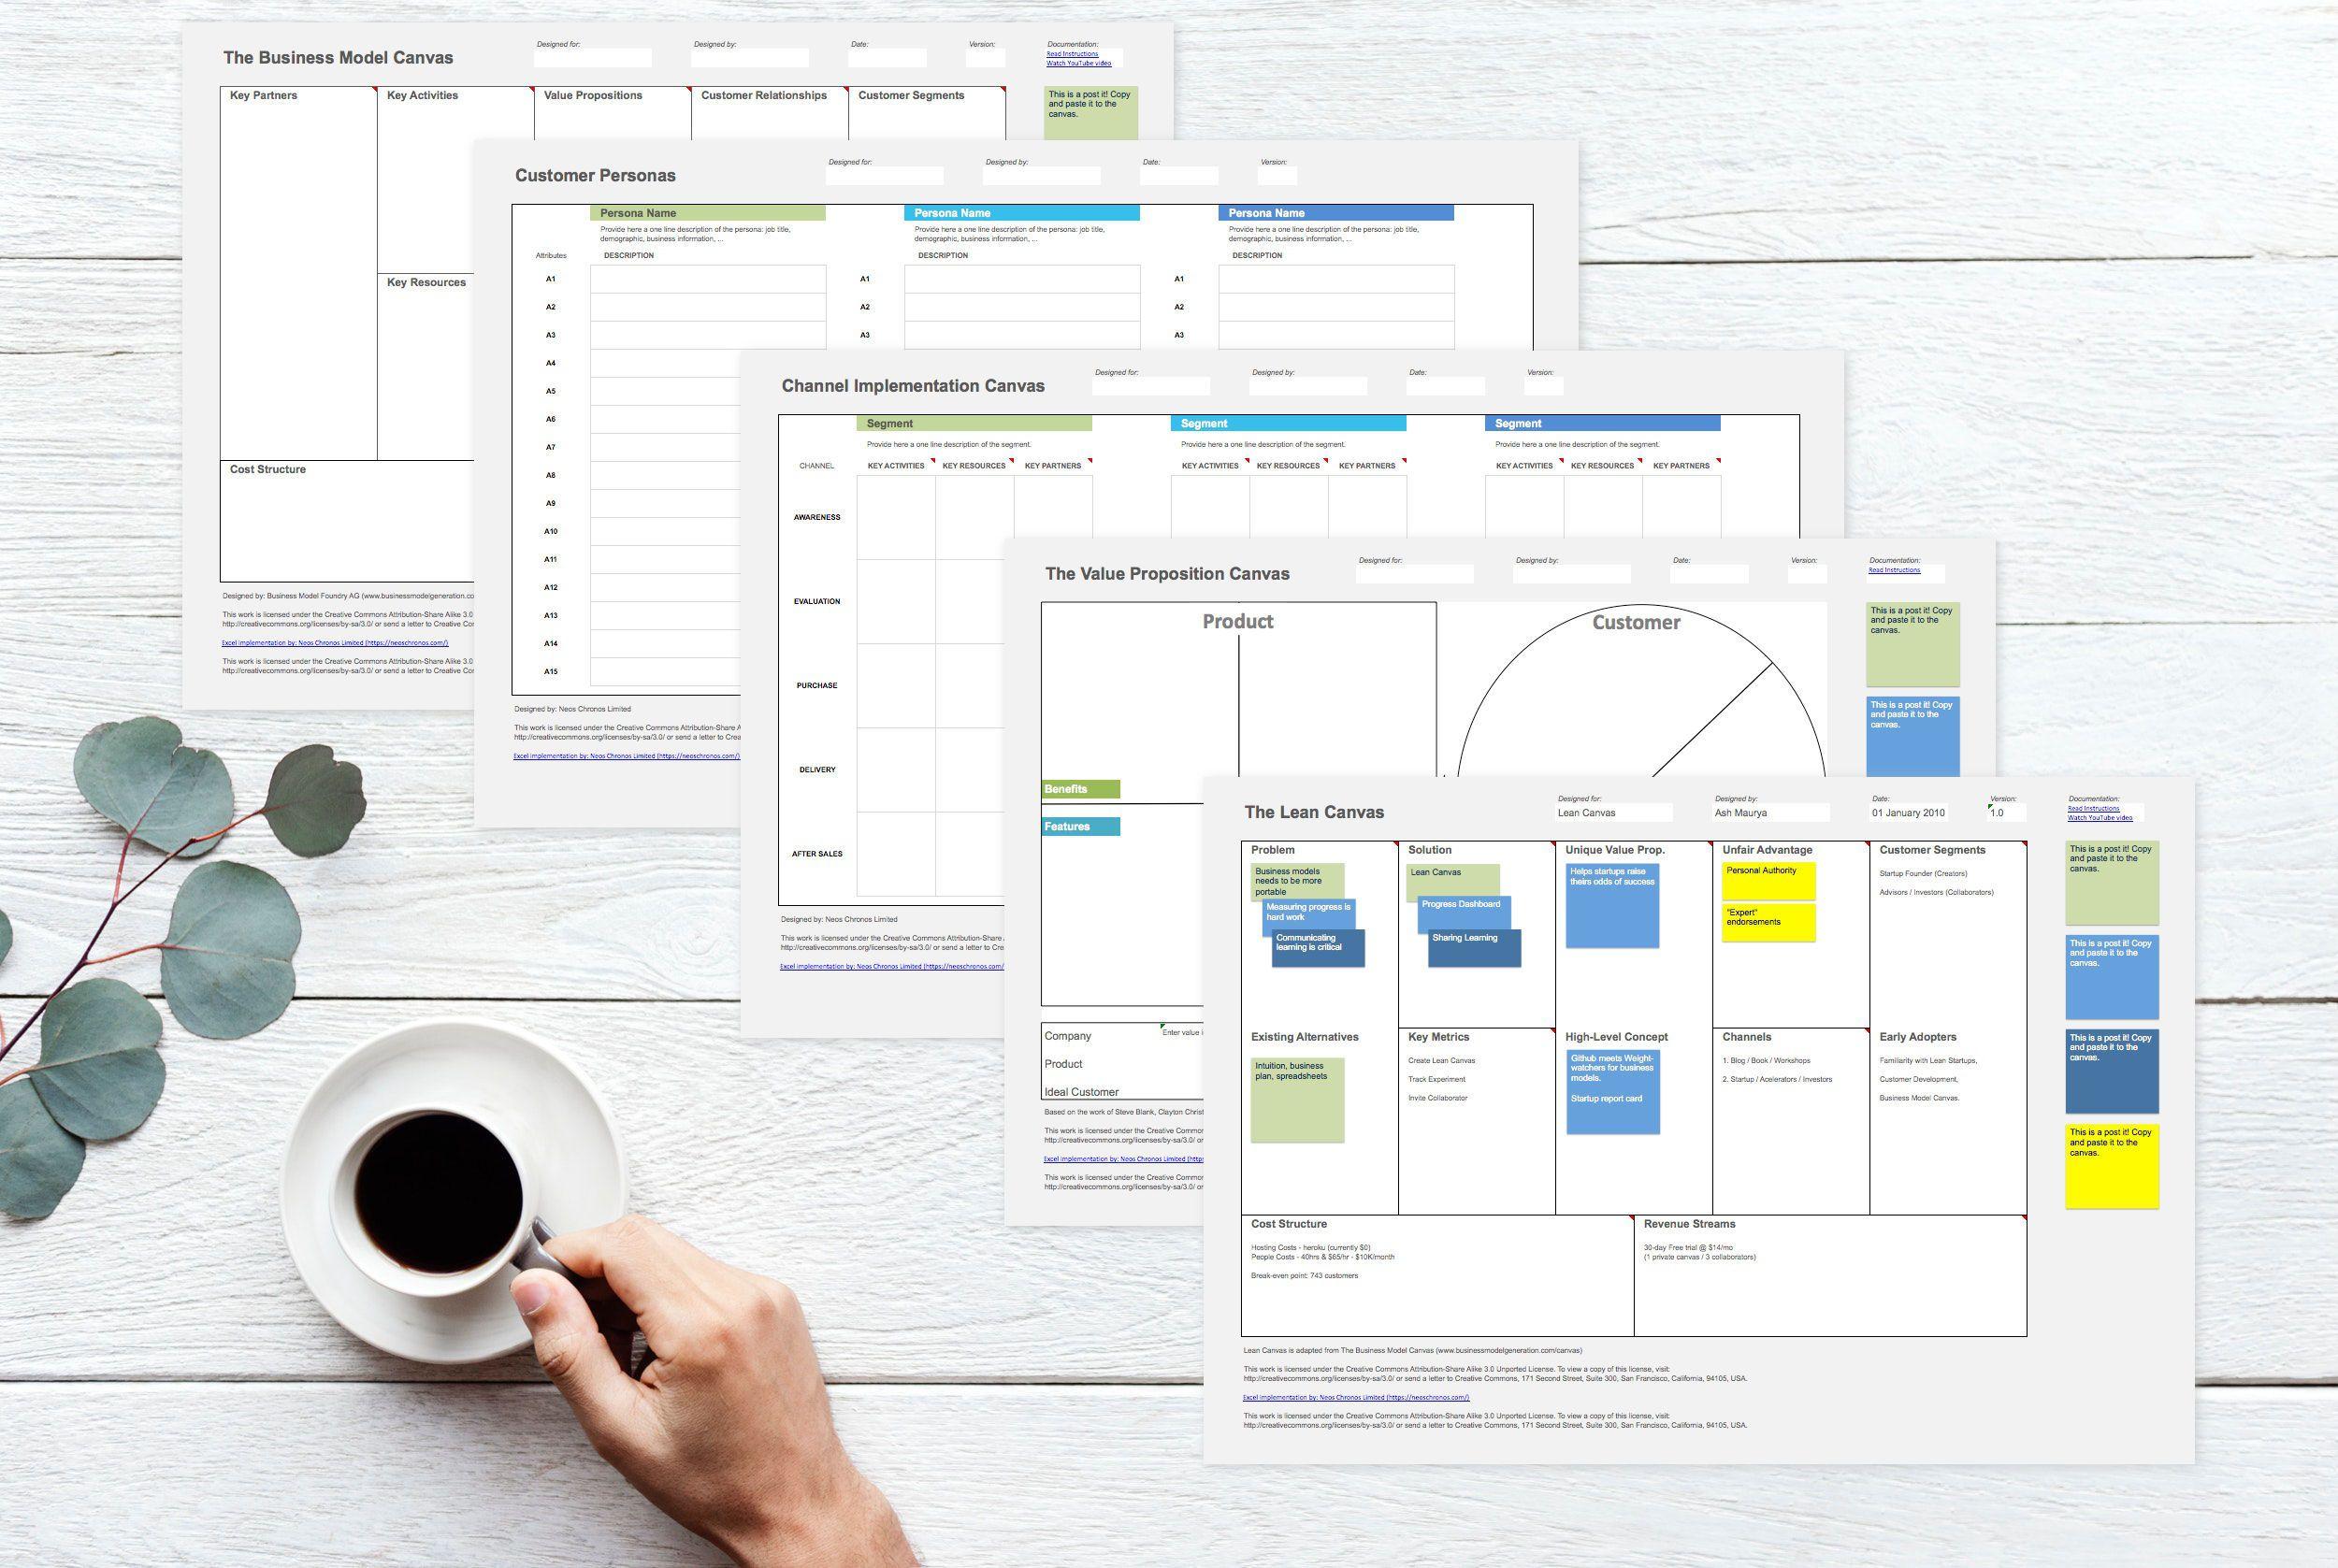 003 Breathtaking Busines Model Canva Template Excel Deutsch Concept Full